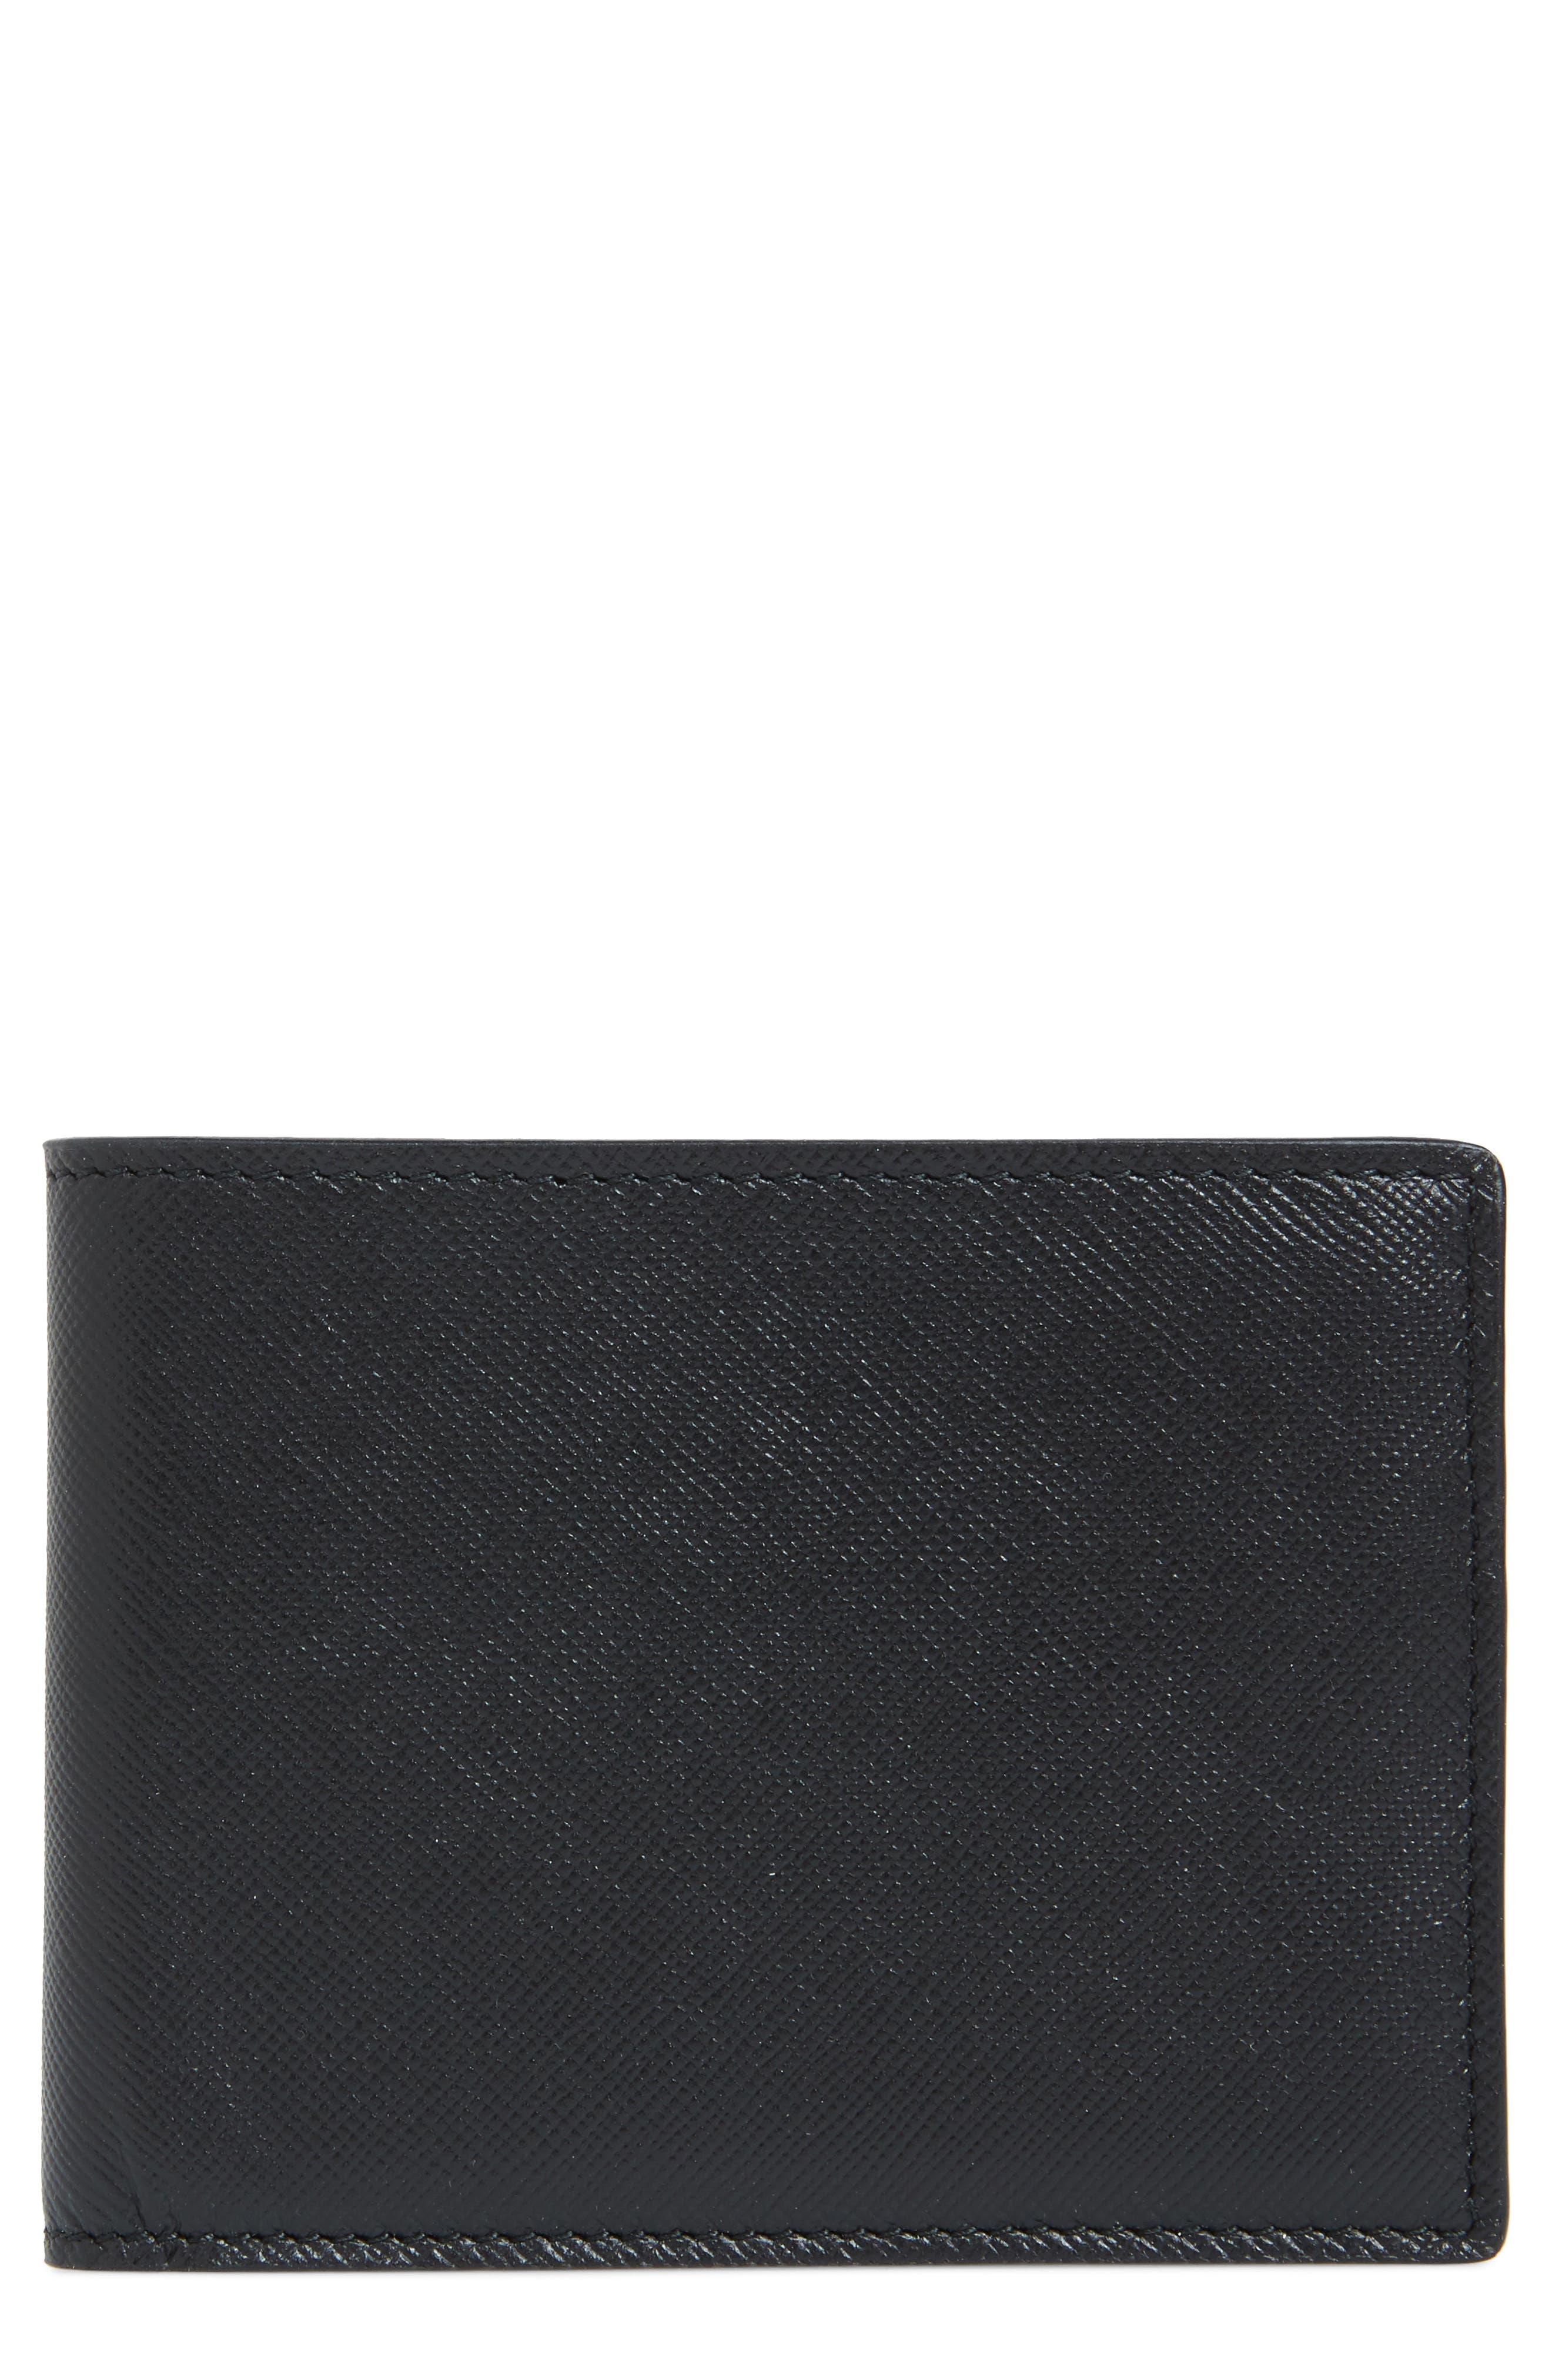 Saffiano Leather Wallet, Main, color, BLACK